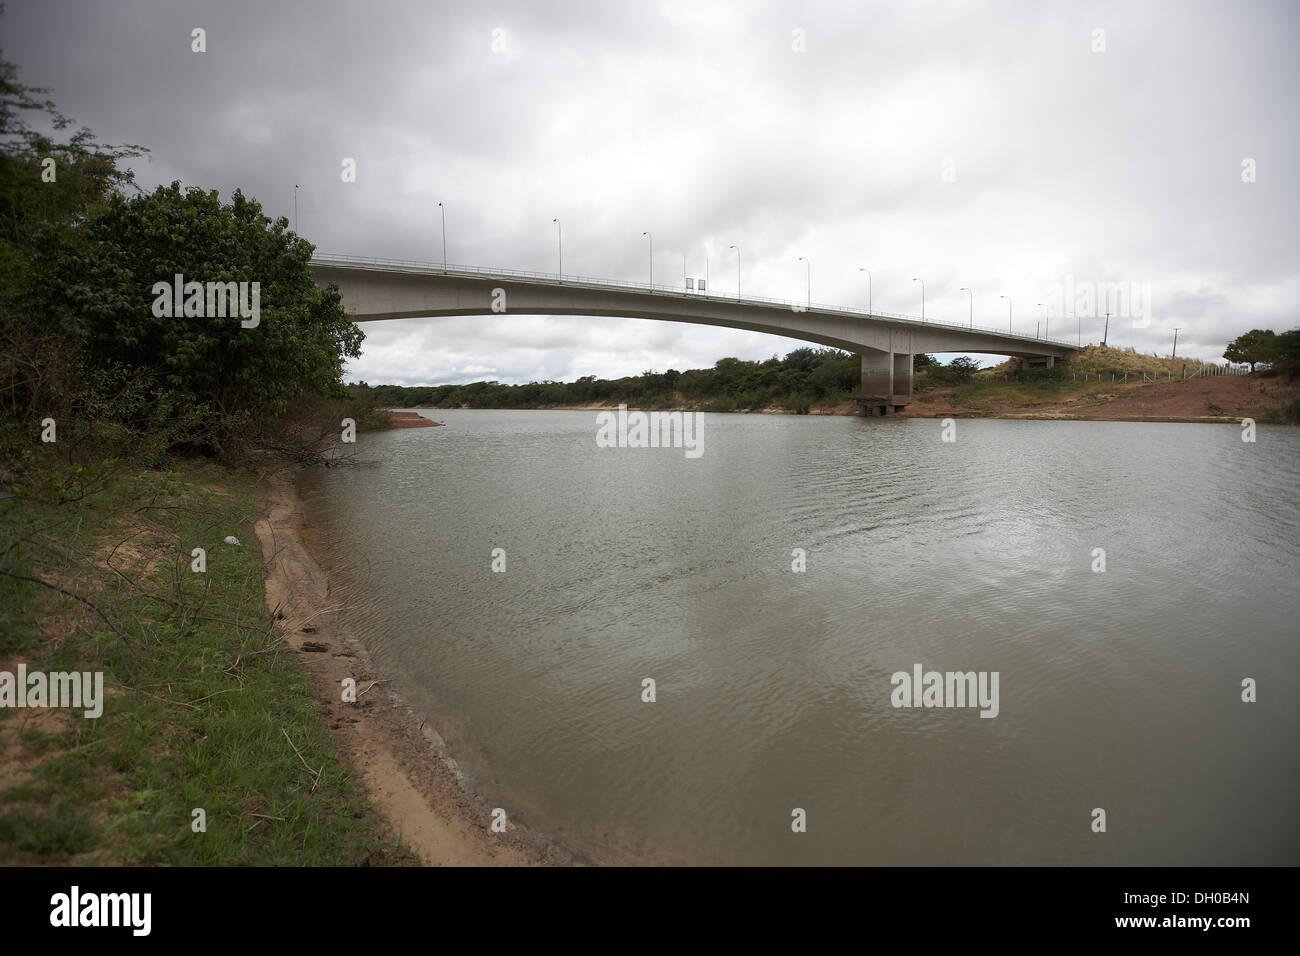 The new border bridge in Letham, Guyana, South America - Stock Image